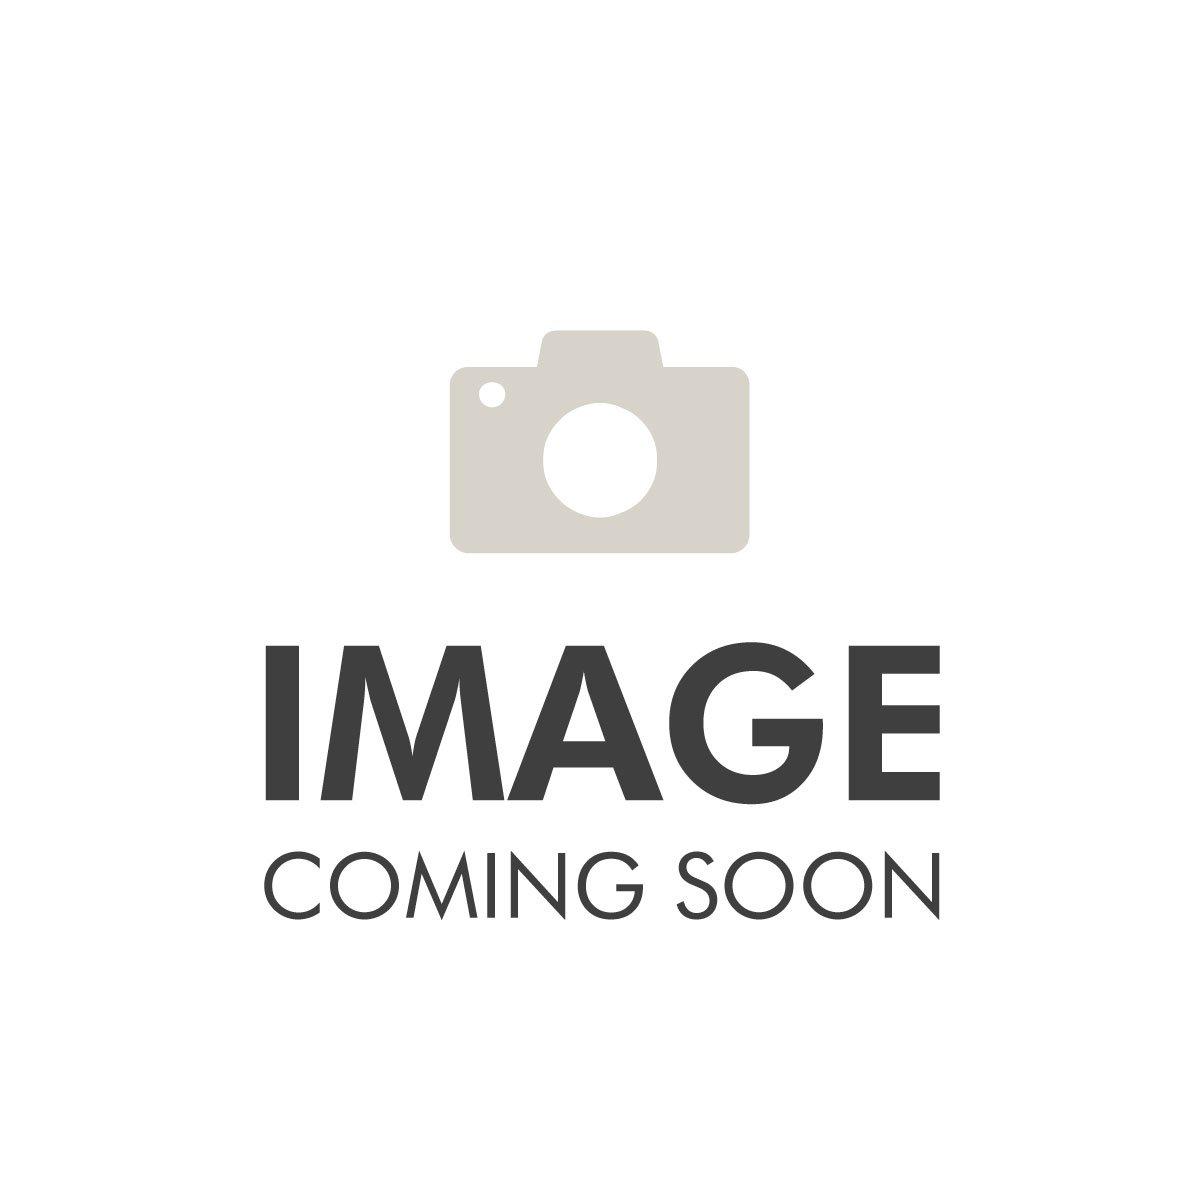 Allstar - Veste métallique de fleuret - Femme - Inox